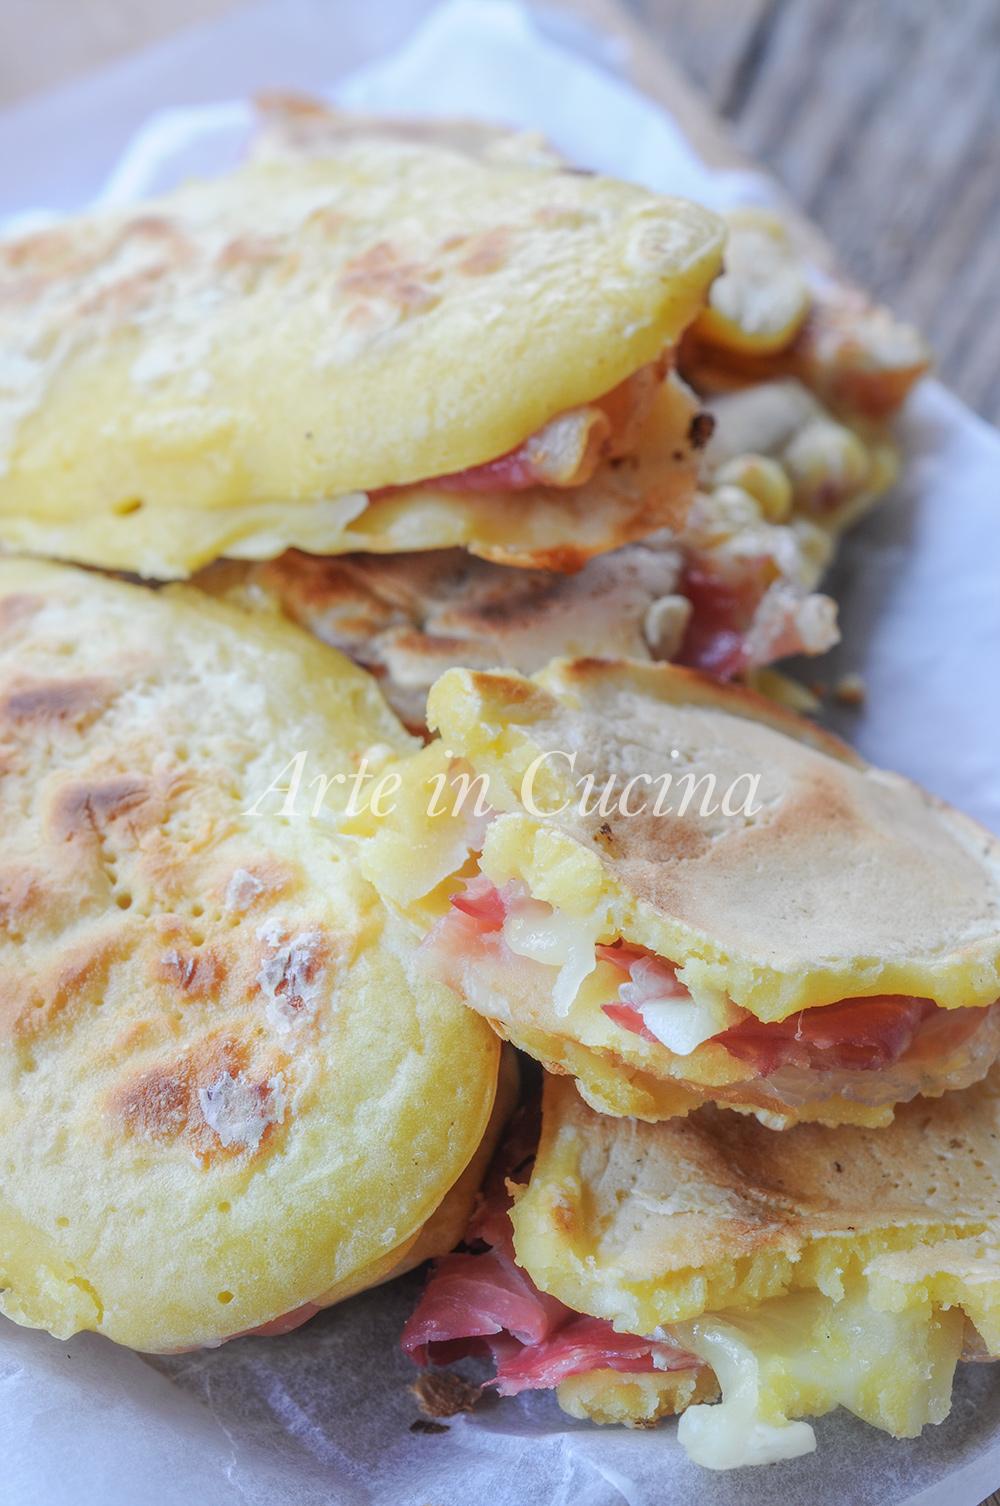 Focaccine salate con pancetta morbidissime veloci vickyart arte in cucina